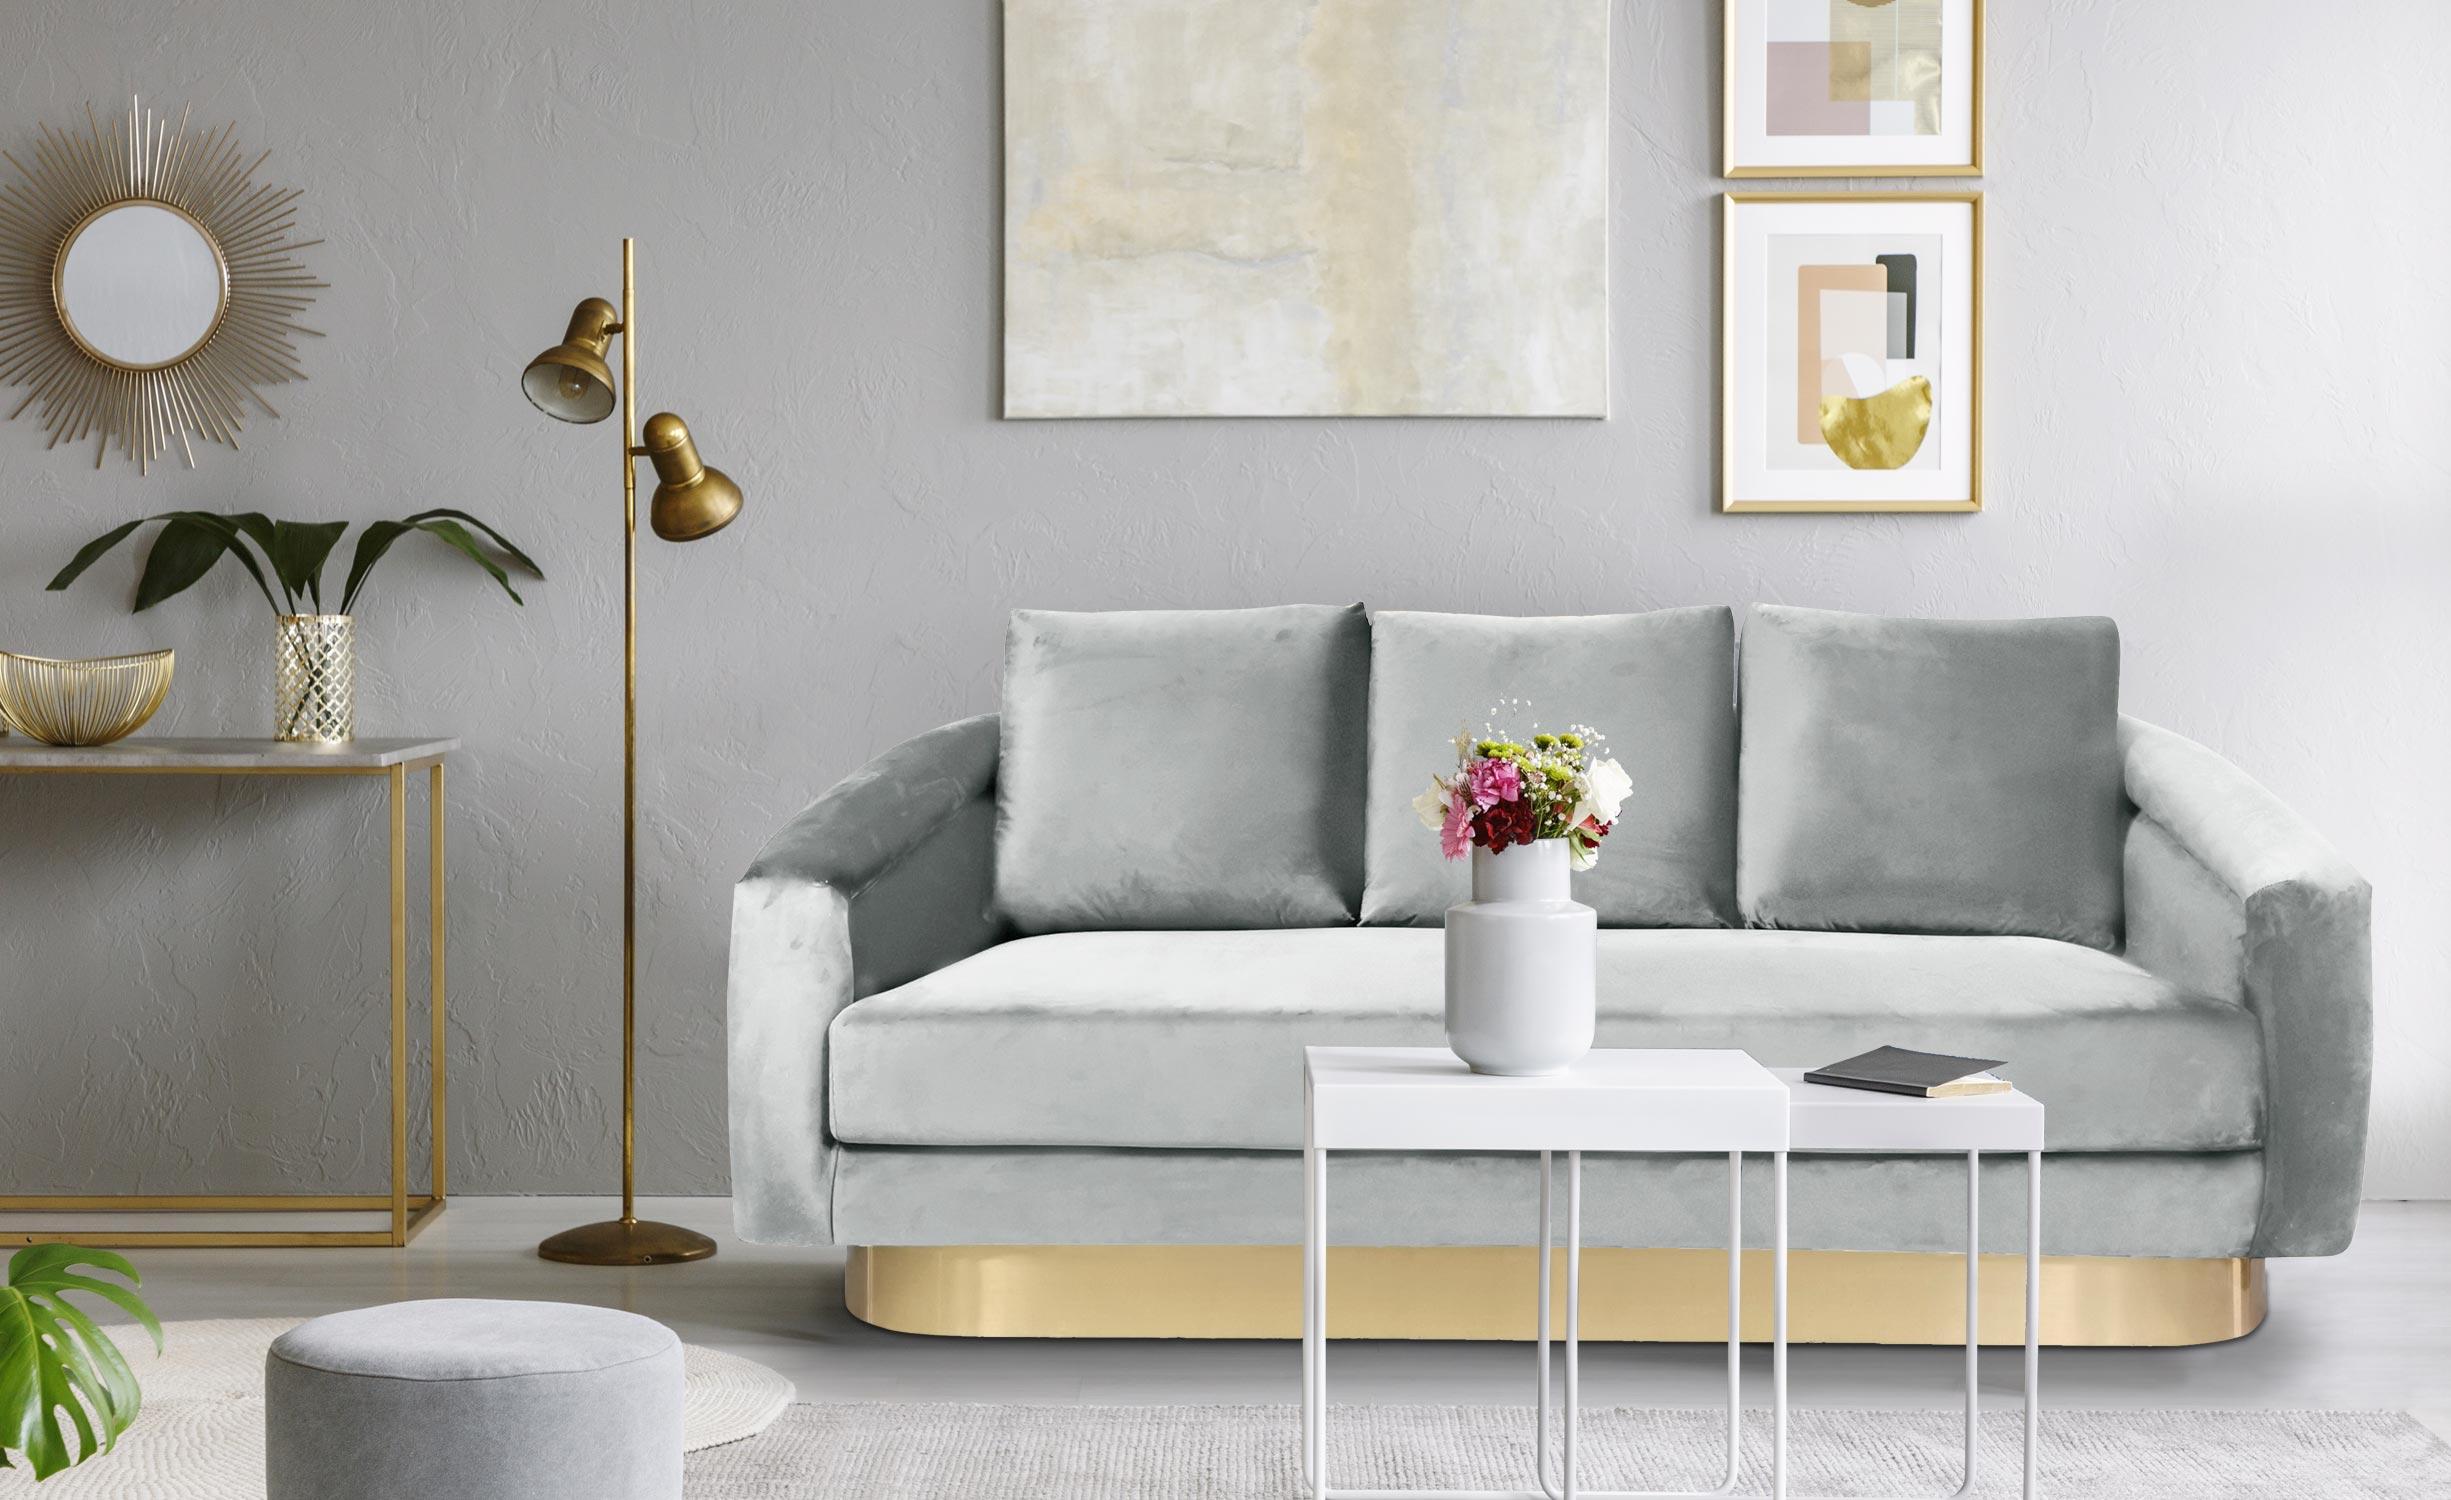 Kenpark divano 3 posti in velluto argento